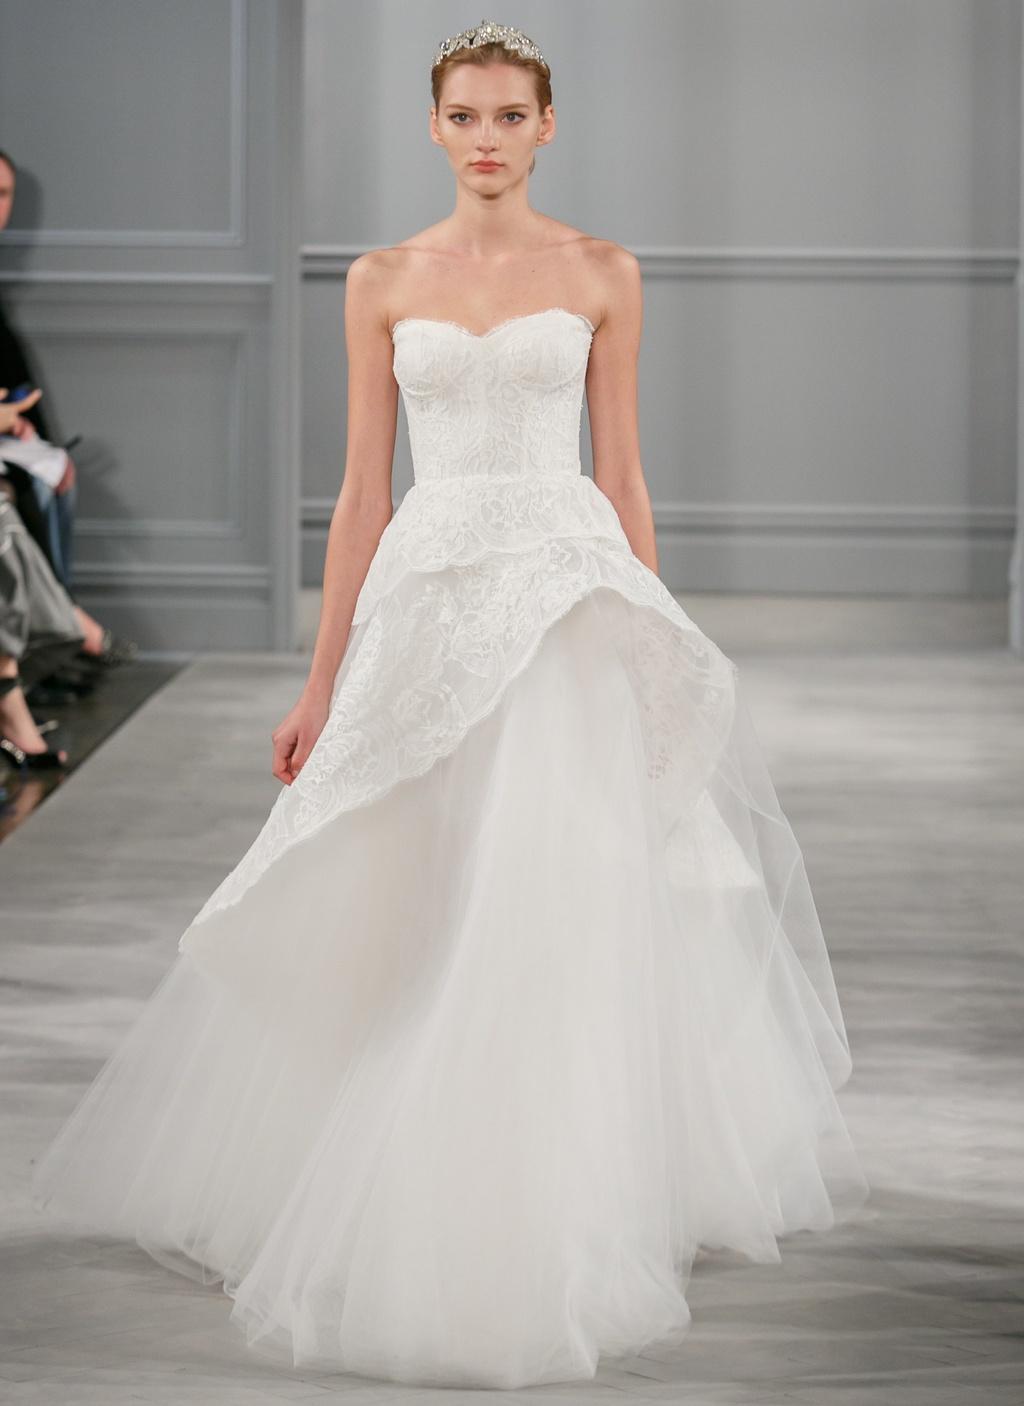 Spring-2014-wedding-dress-monique-lhuillier-bridal-azure-5.full